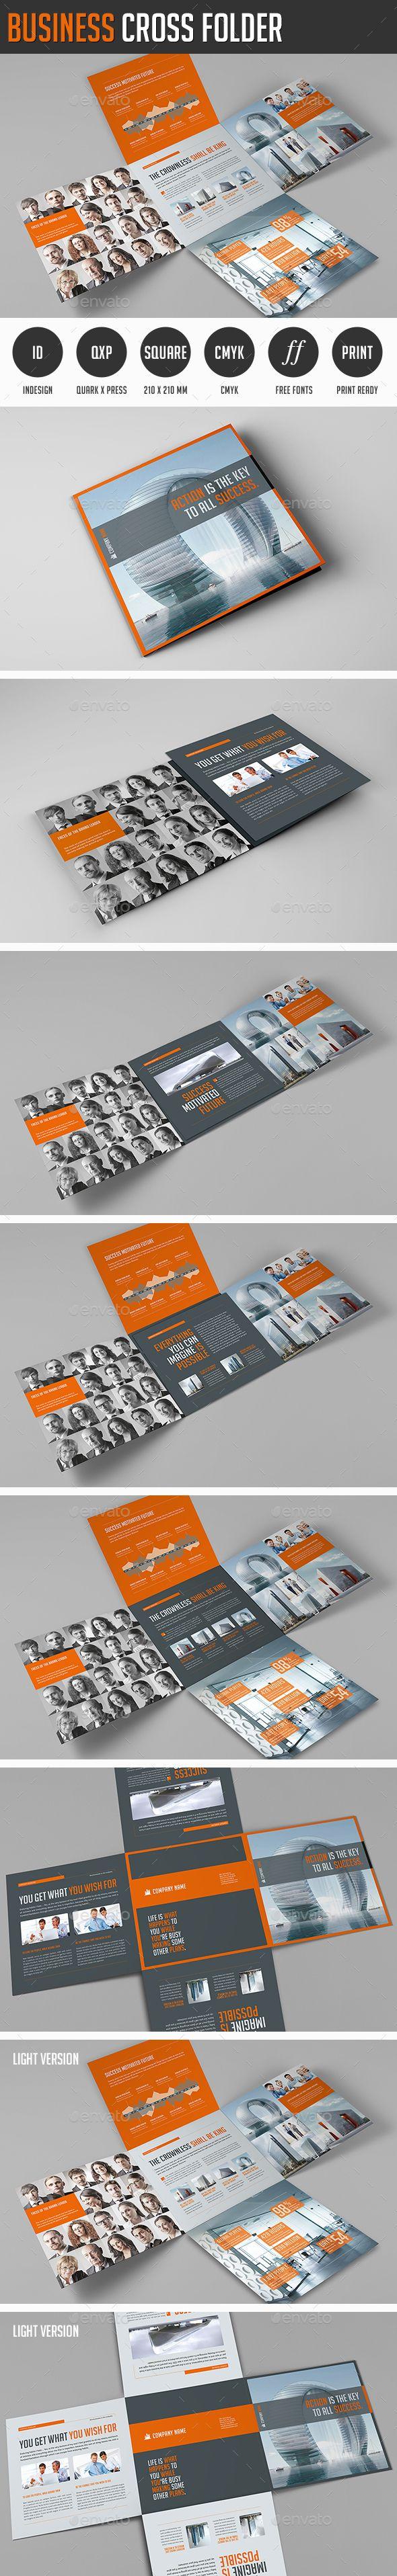 Business Cross Folder - Corporate Flyers